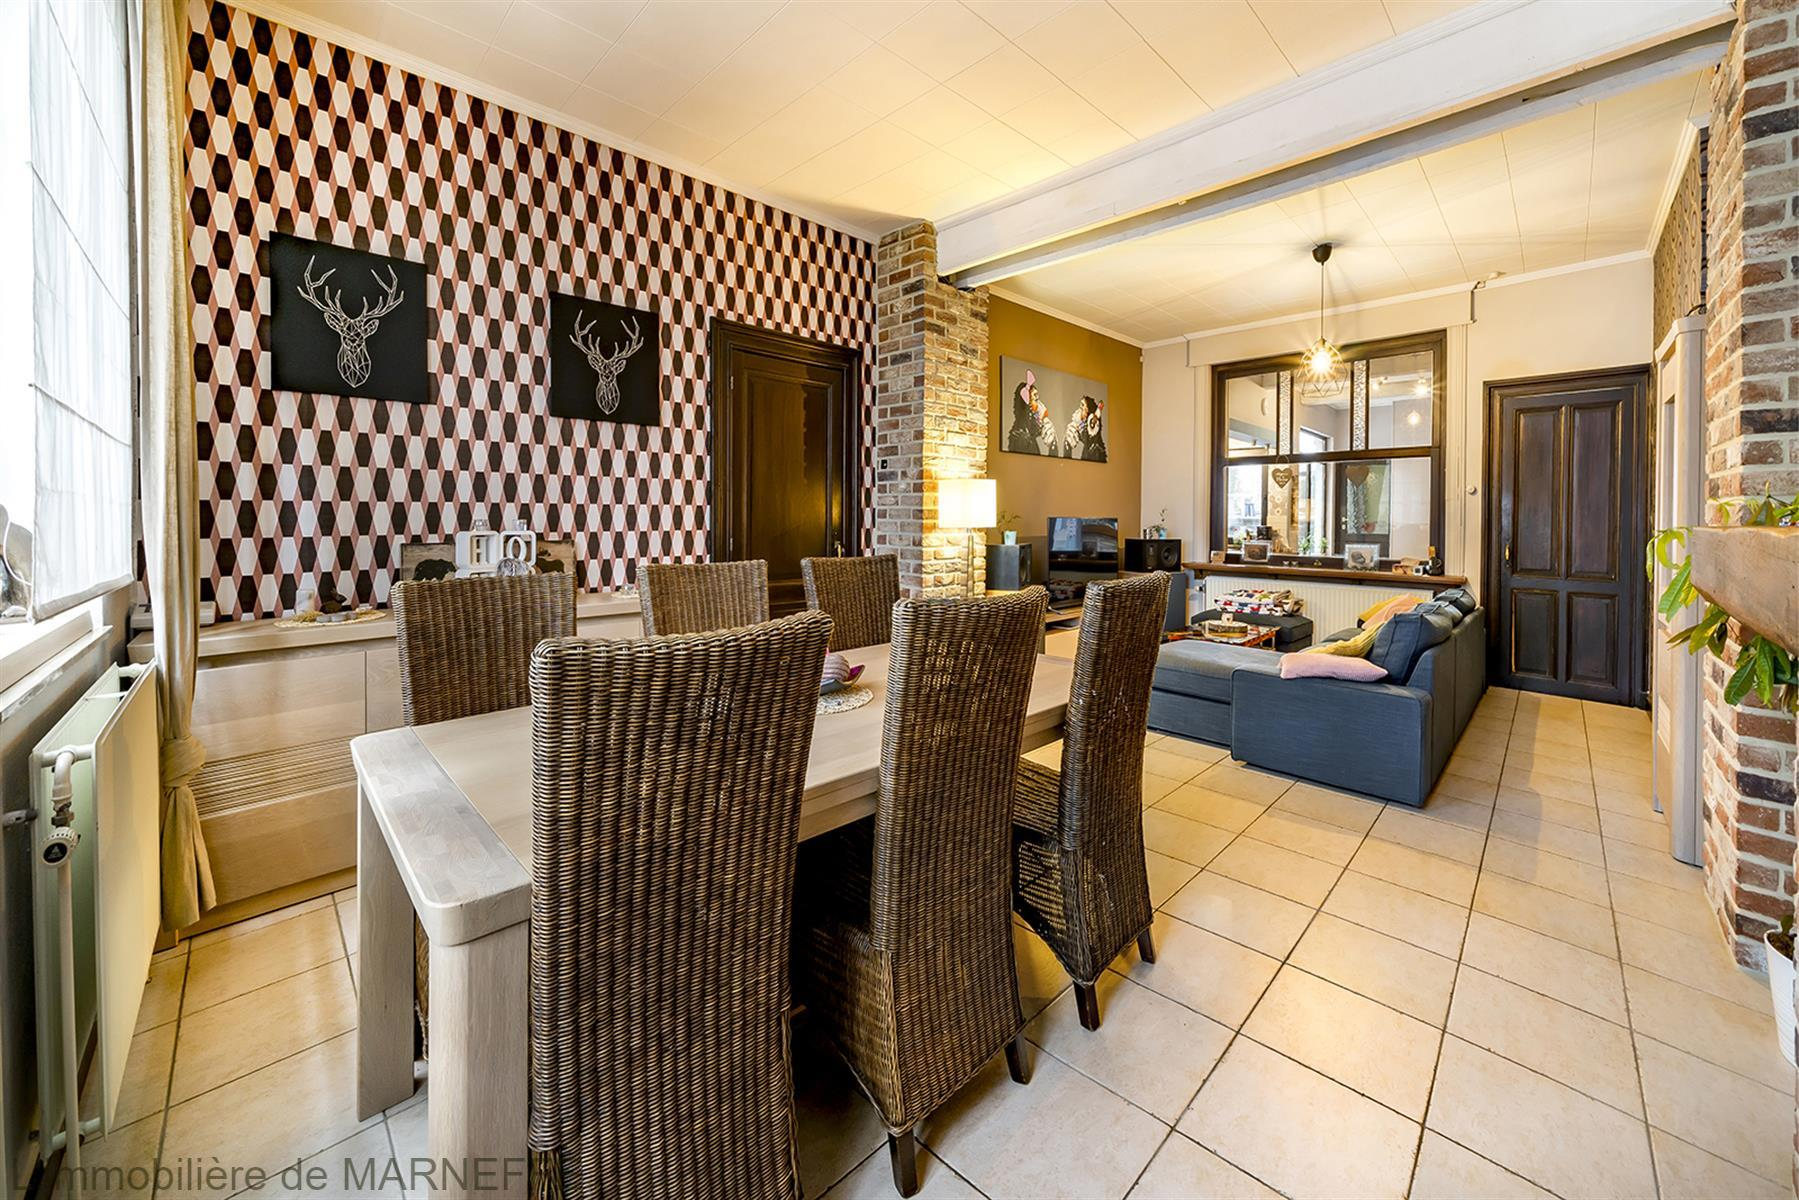 Maison - Remicourt - #3704833-34